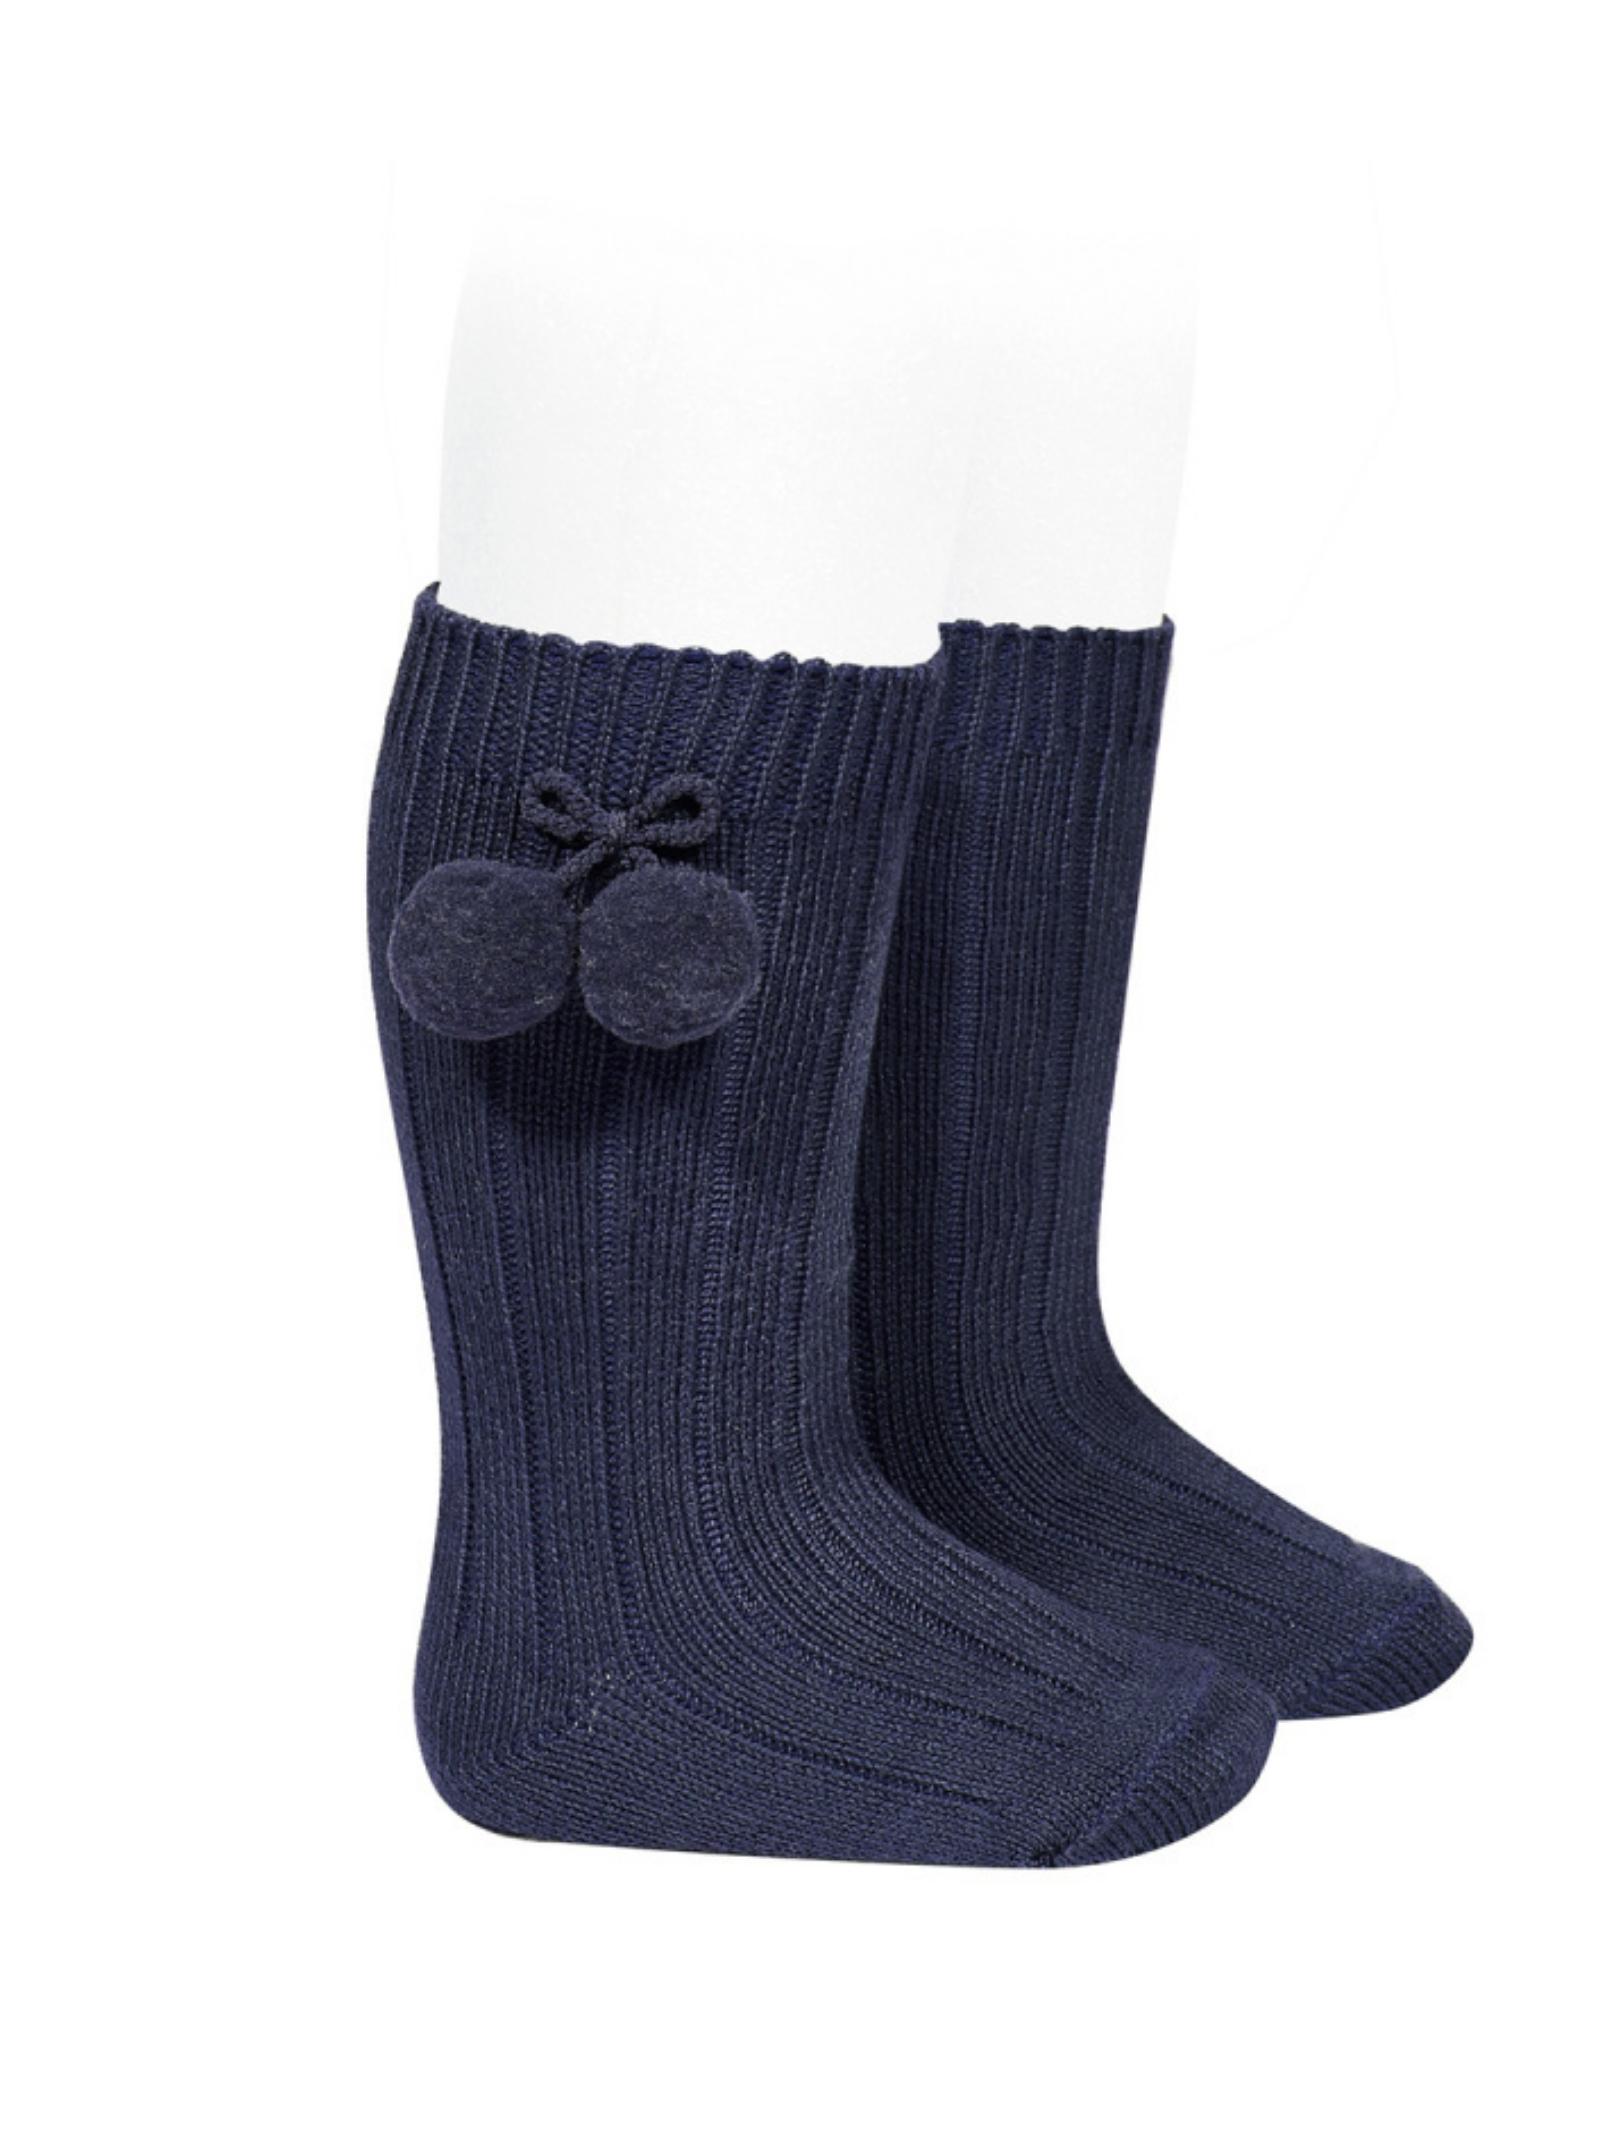 Ribbed Pompon Socks for Girls CONDOR | Socks | 30152480